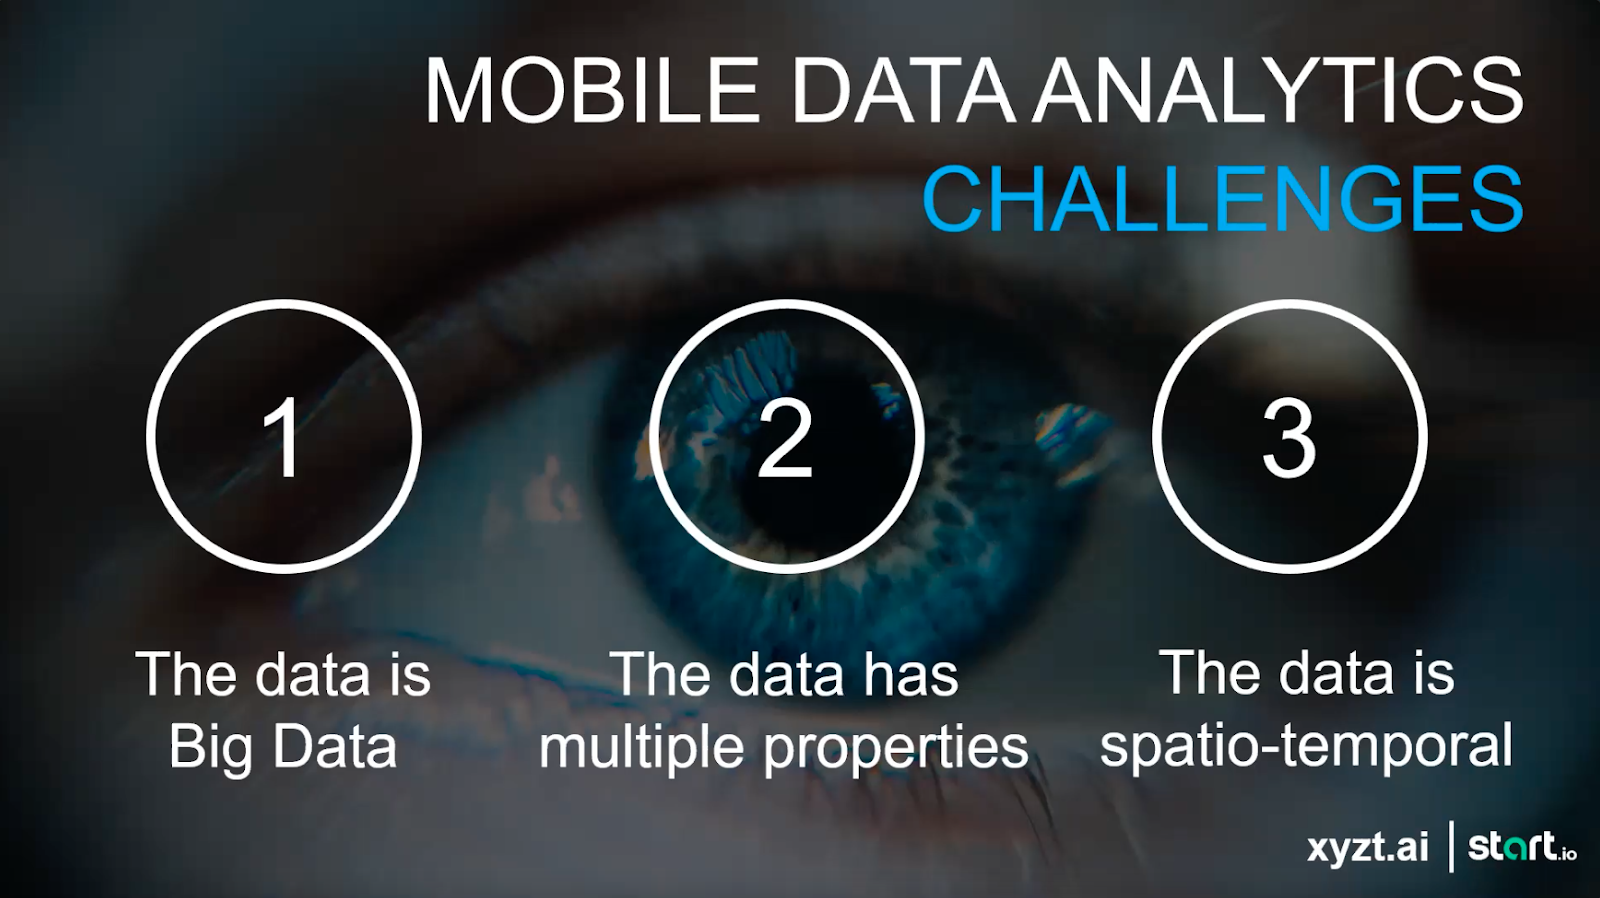 Mobile Data Analytics challenges